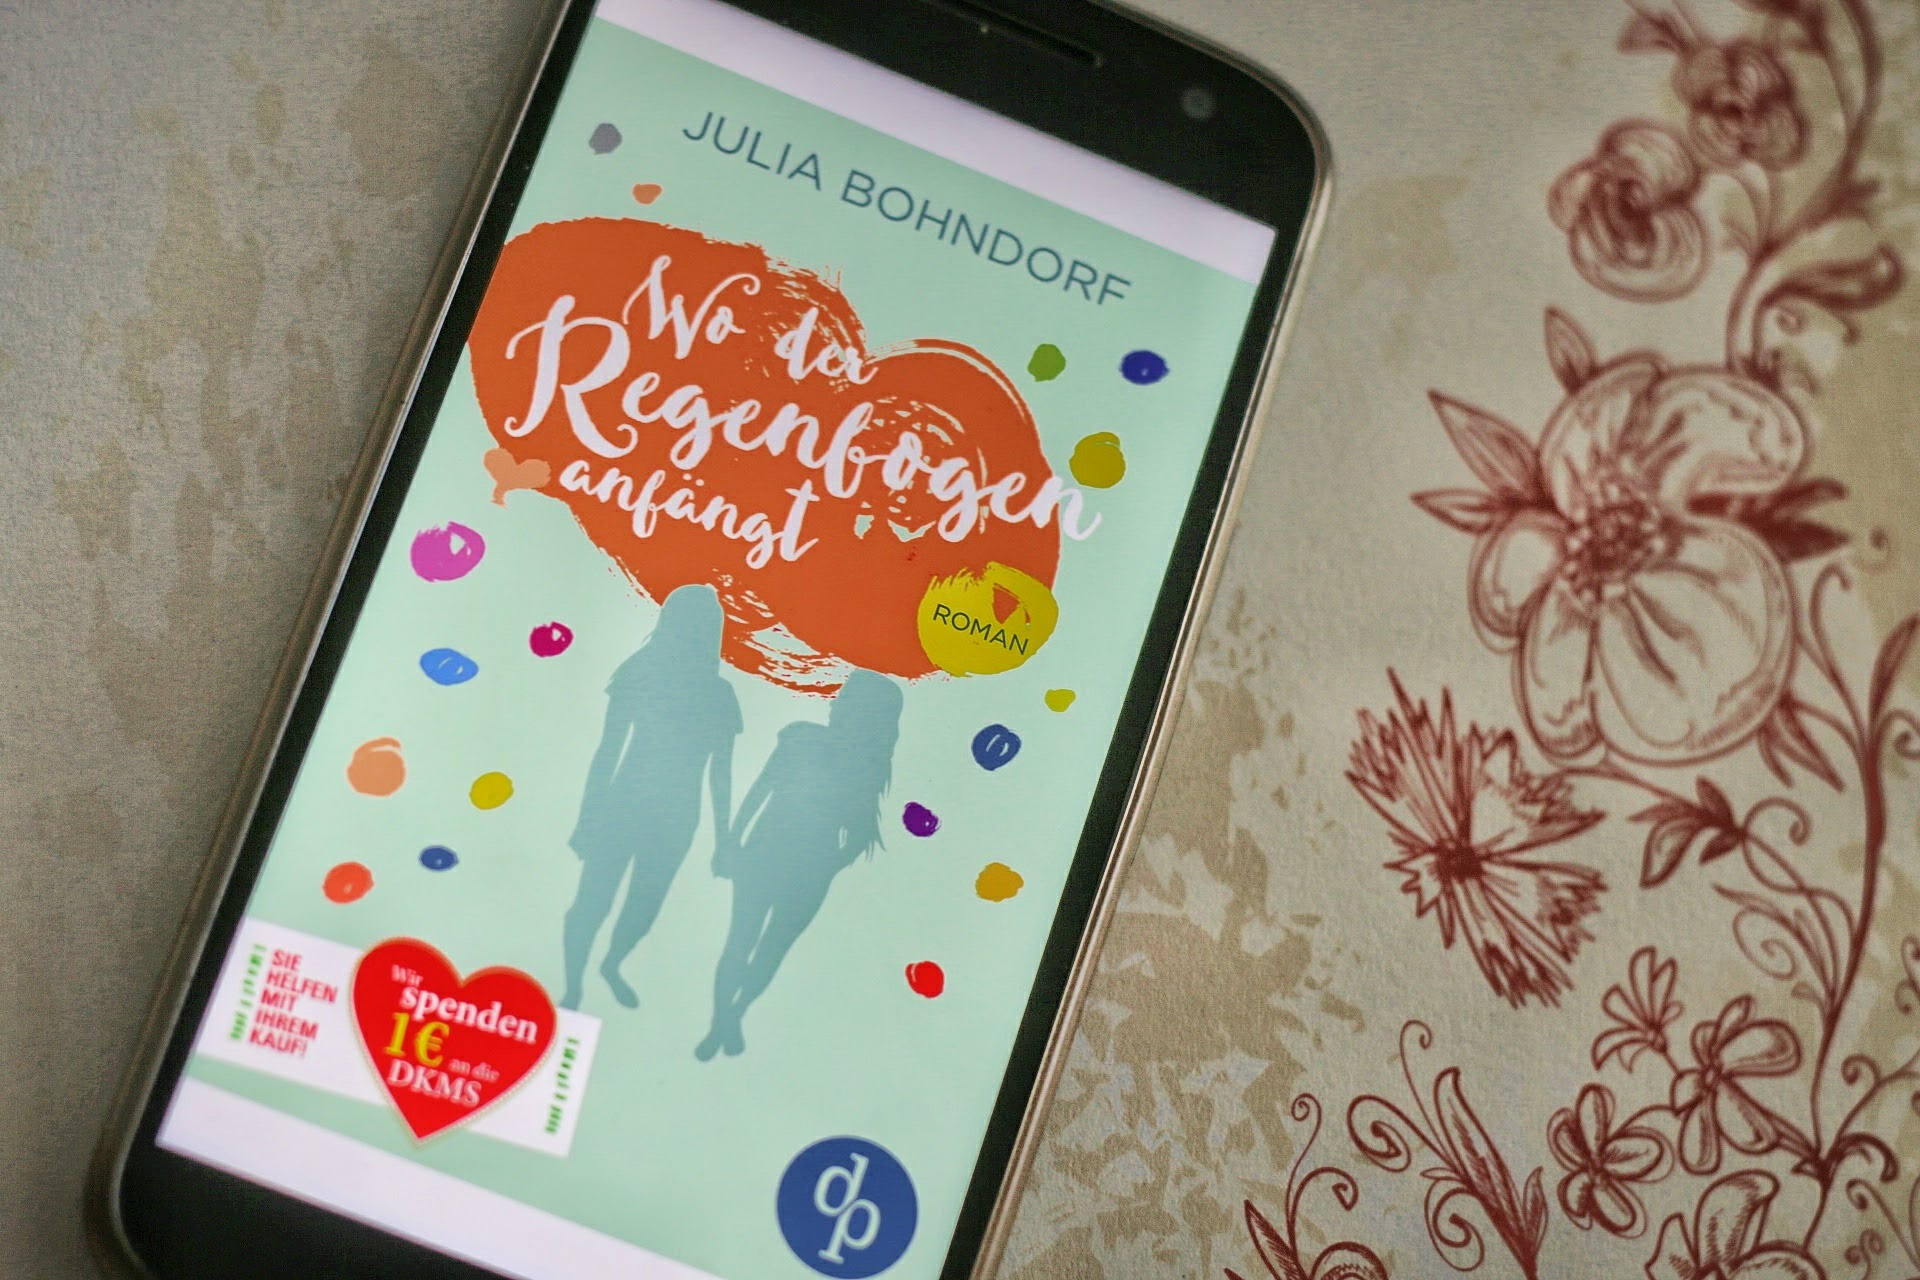 Julia Bohndorf Wo der Regenbogen anfängt Cover Digital Publishers Verlag DKMS Knochenmark Roman eBook